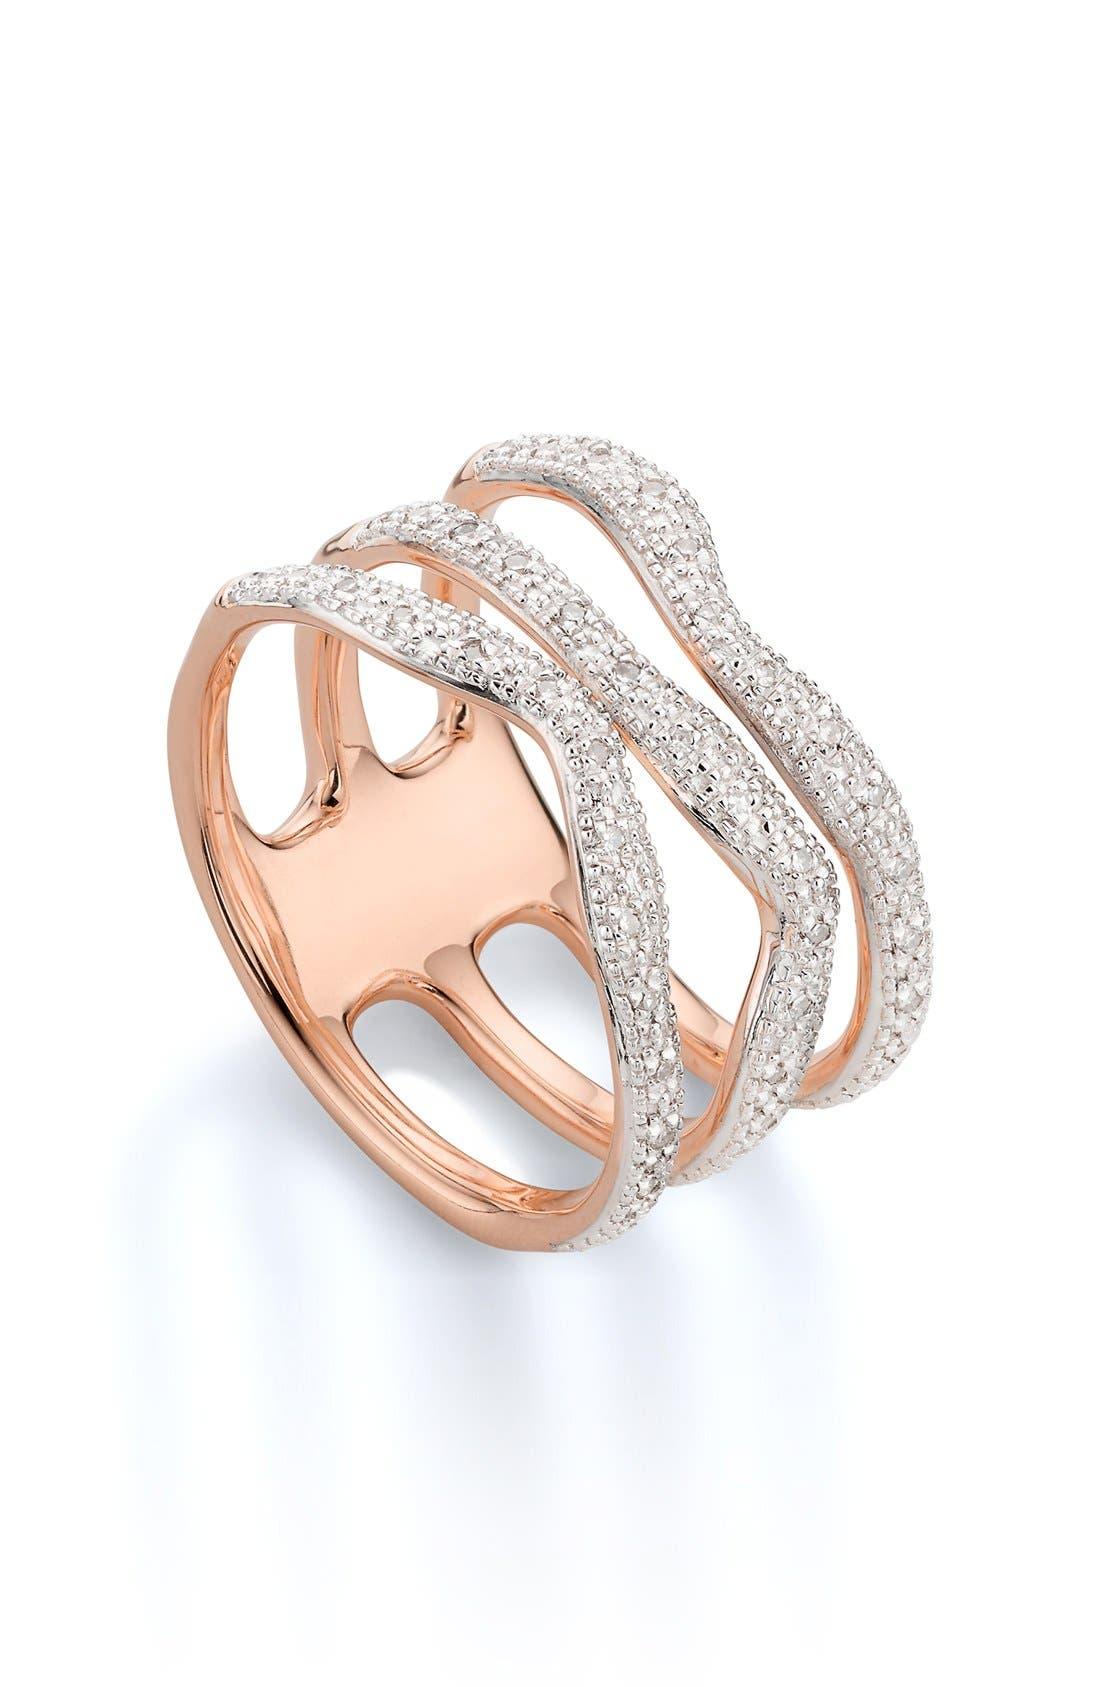 MONICA VINADER Riva Three Band Diamond Ring